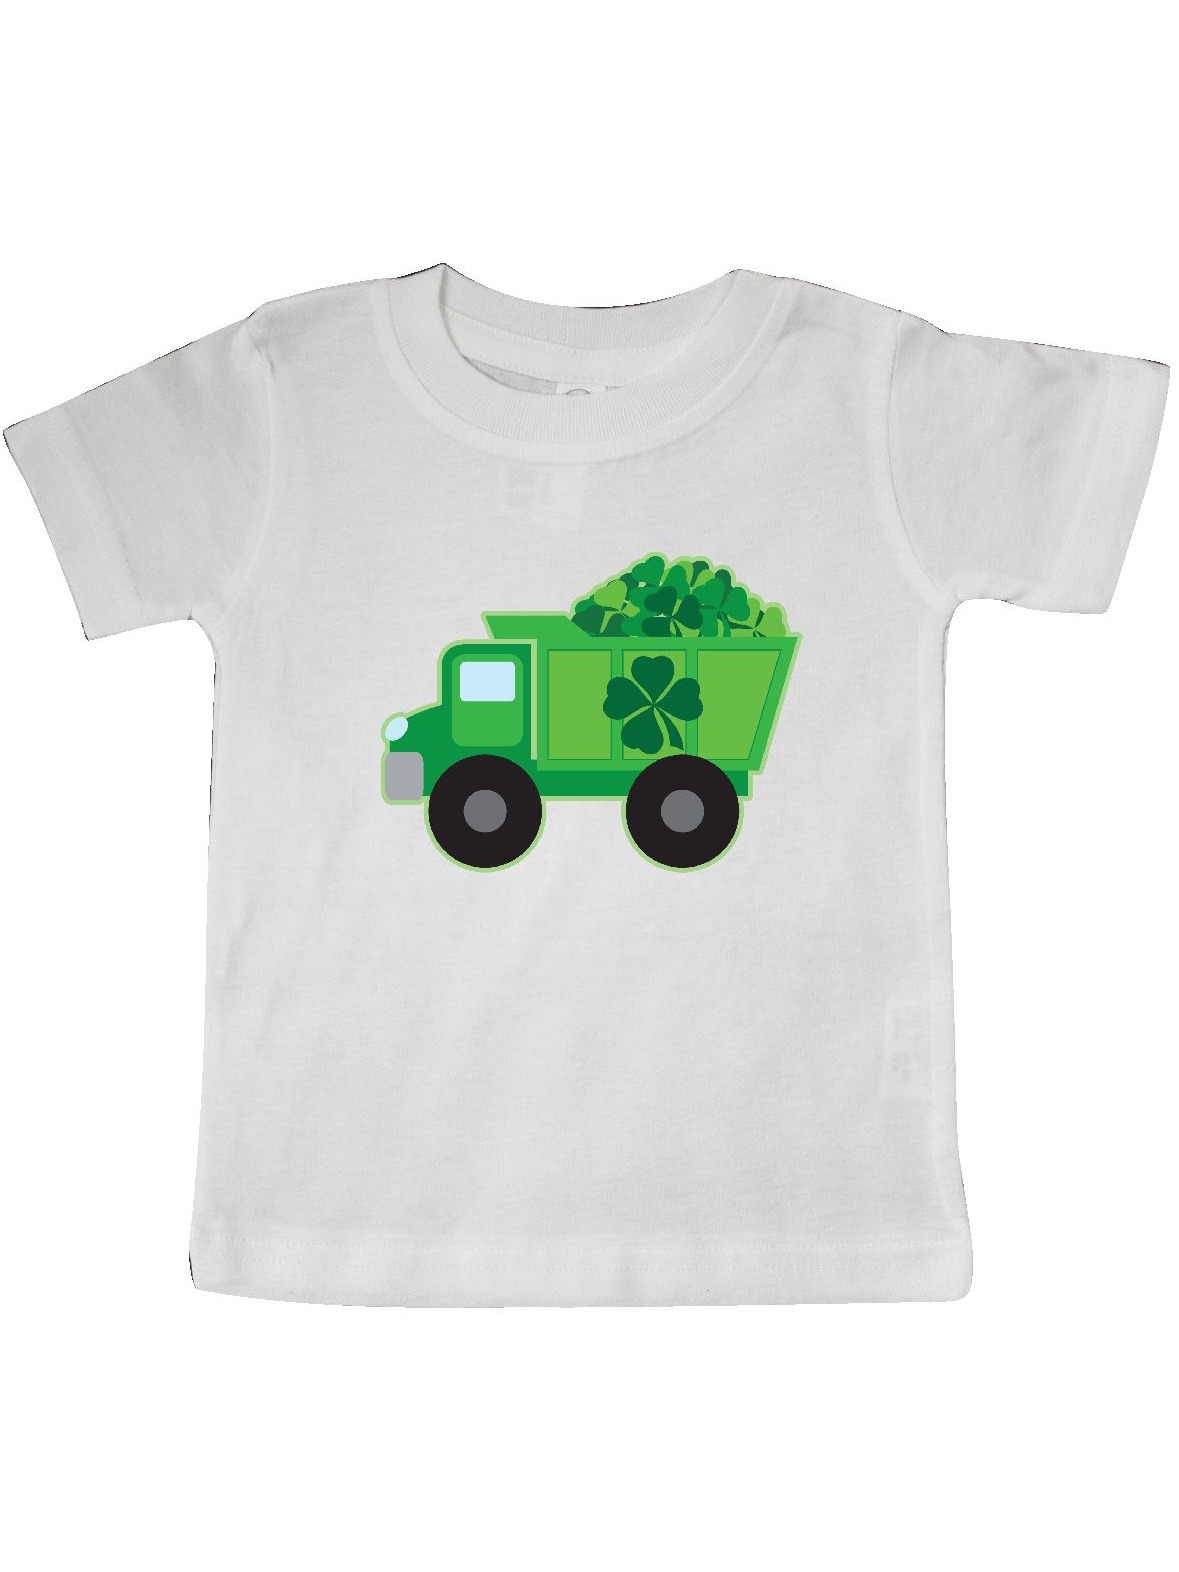 St Patricks Day Irish Clover Dump Truck Childs Baby T-Shirt